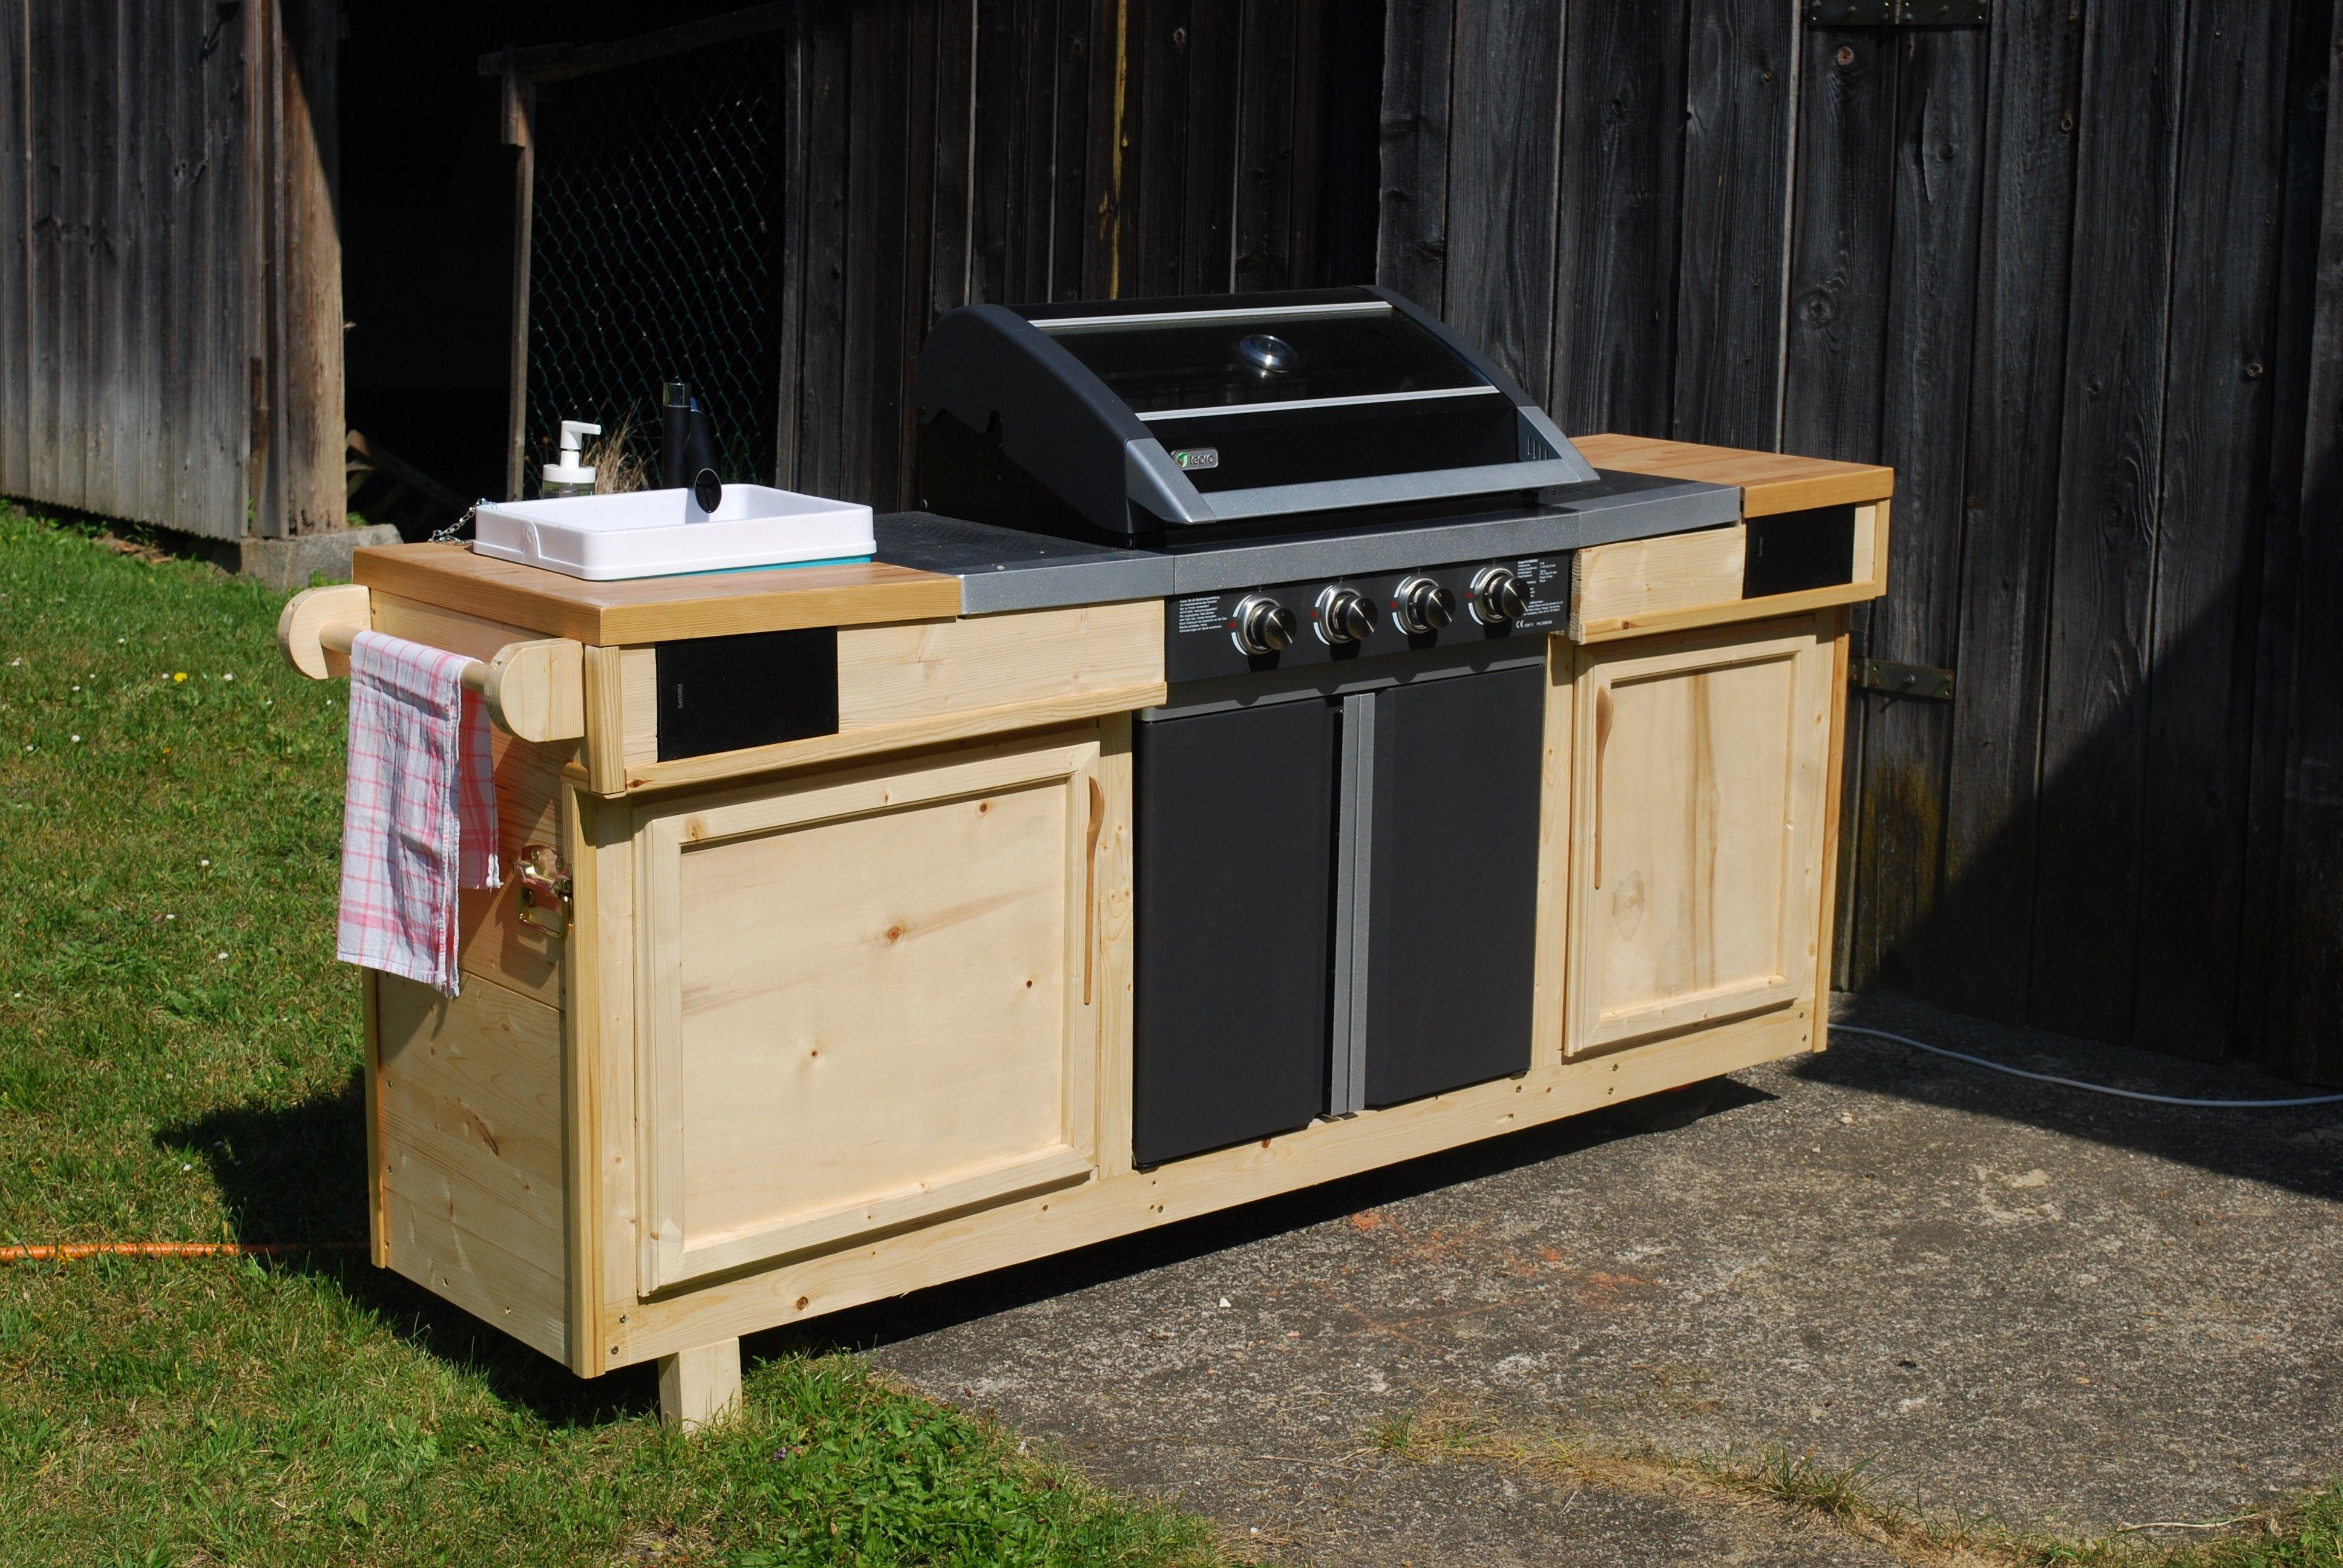 Outdoor Küche Utensilien : Camping outdoor küche garten elektro outdoorküche window by lgtek